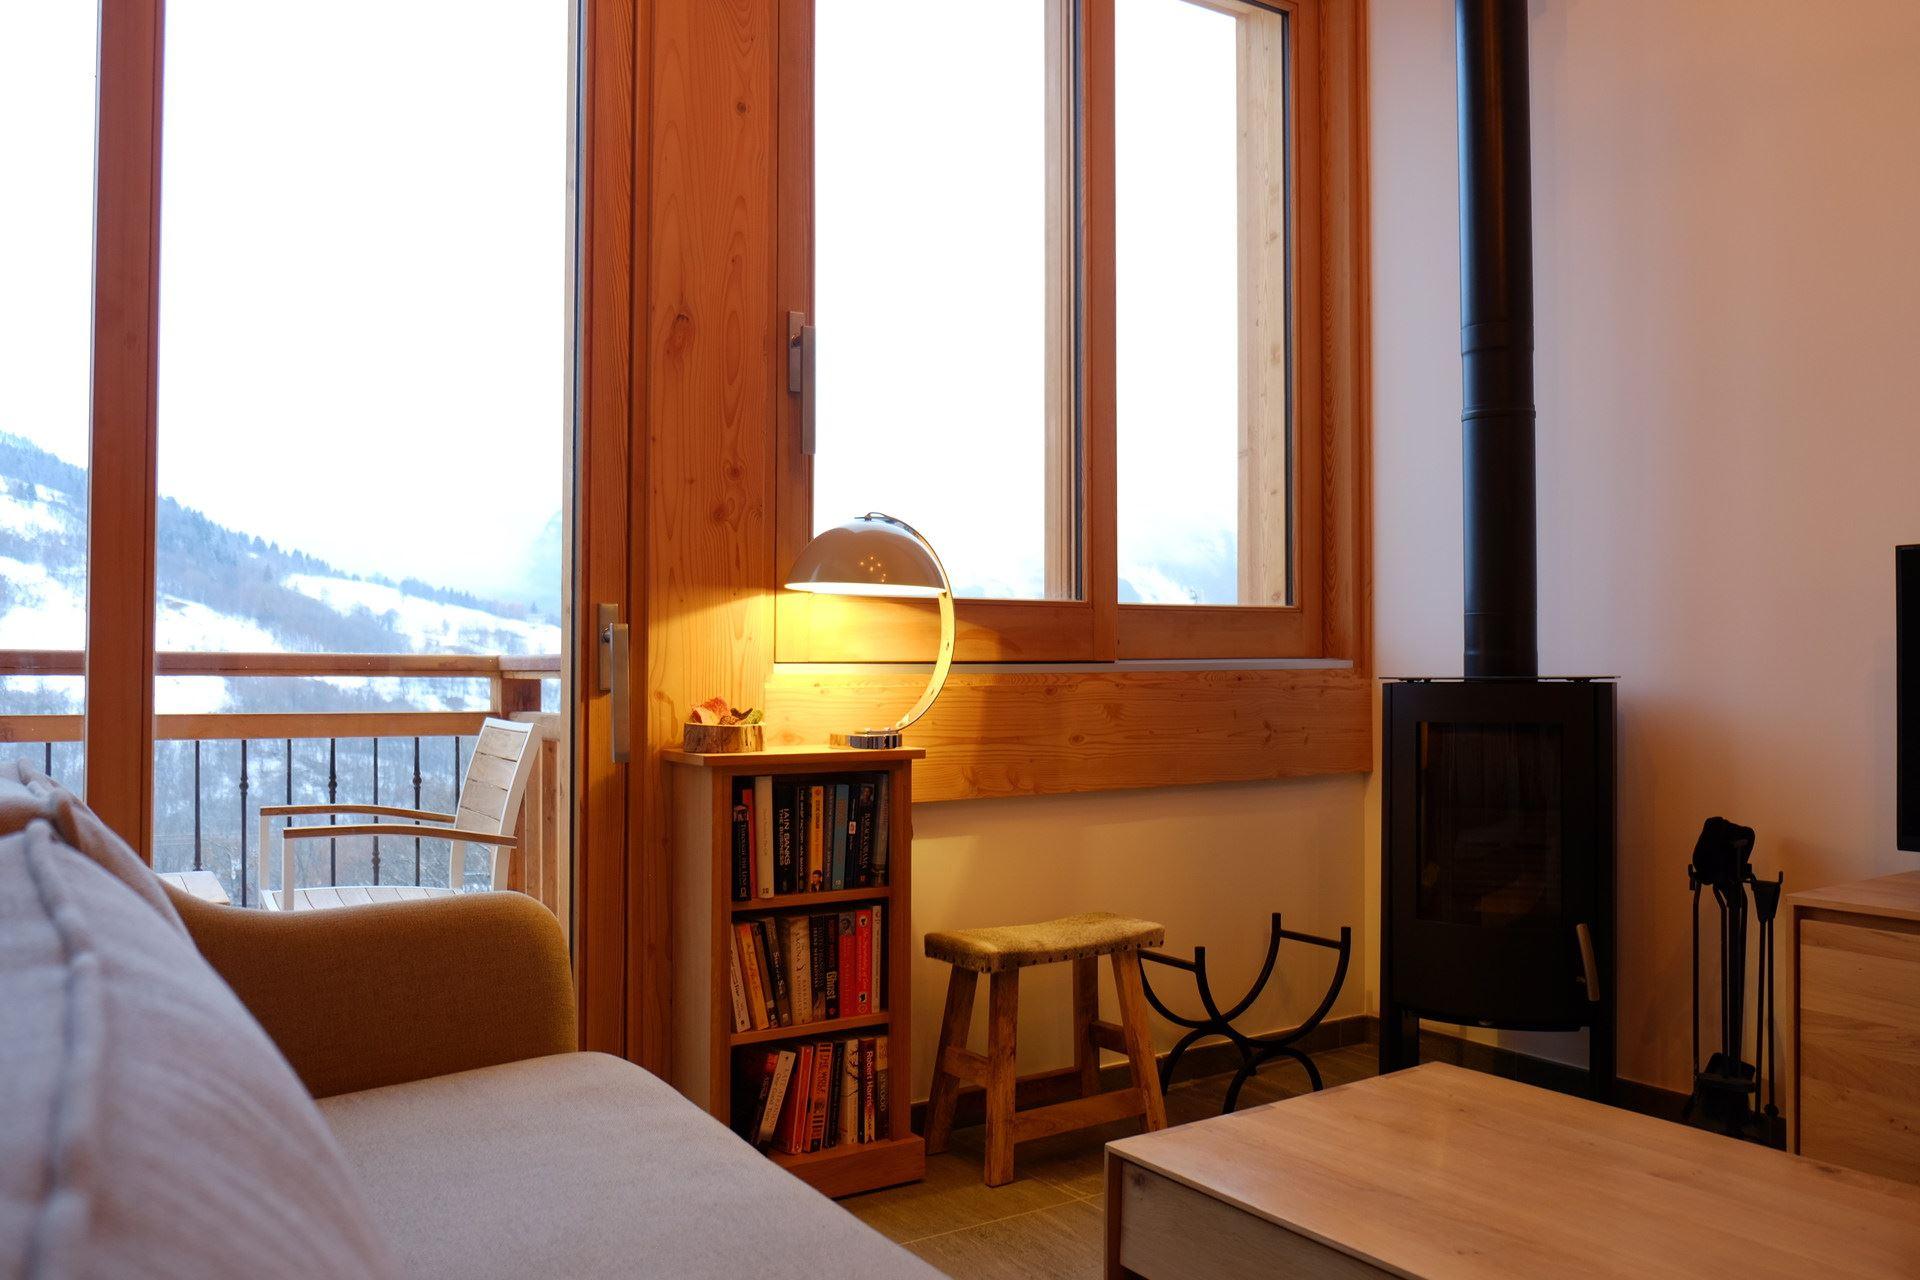 5 Room 9 Pers ski-in ski-out / CASEBLANCHE C24